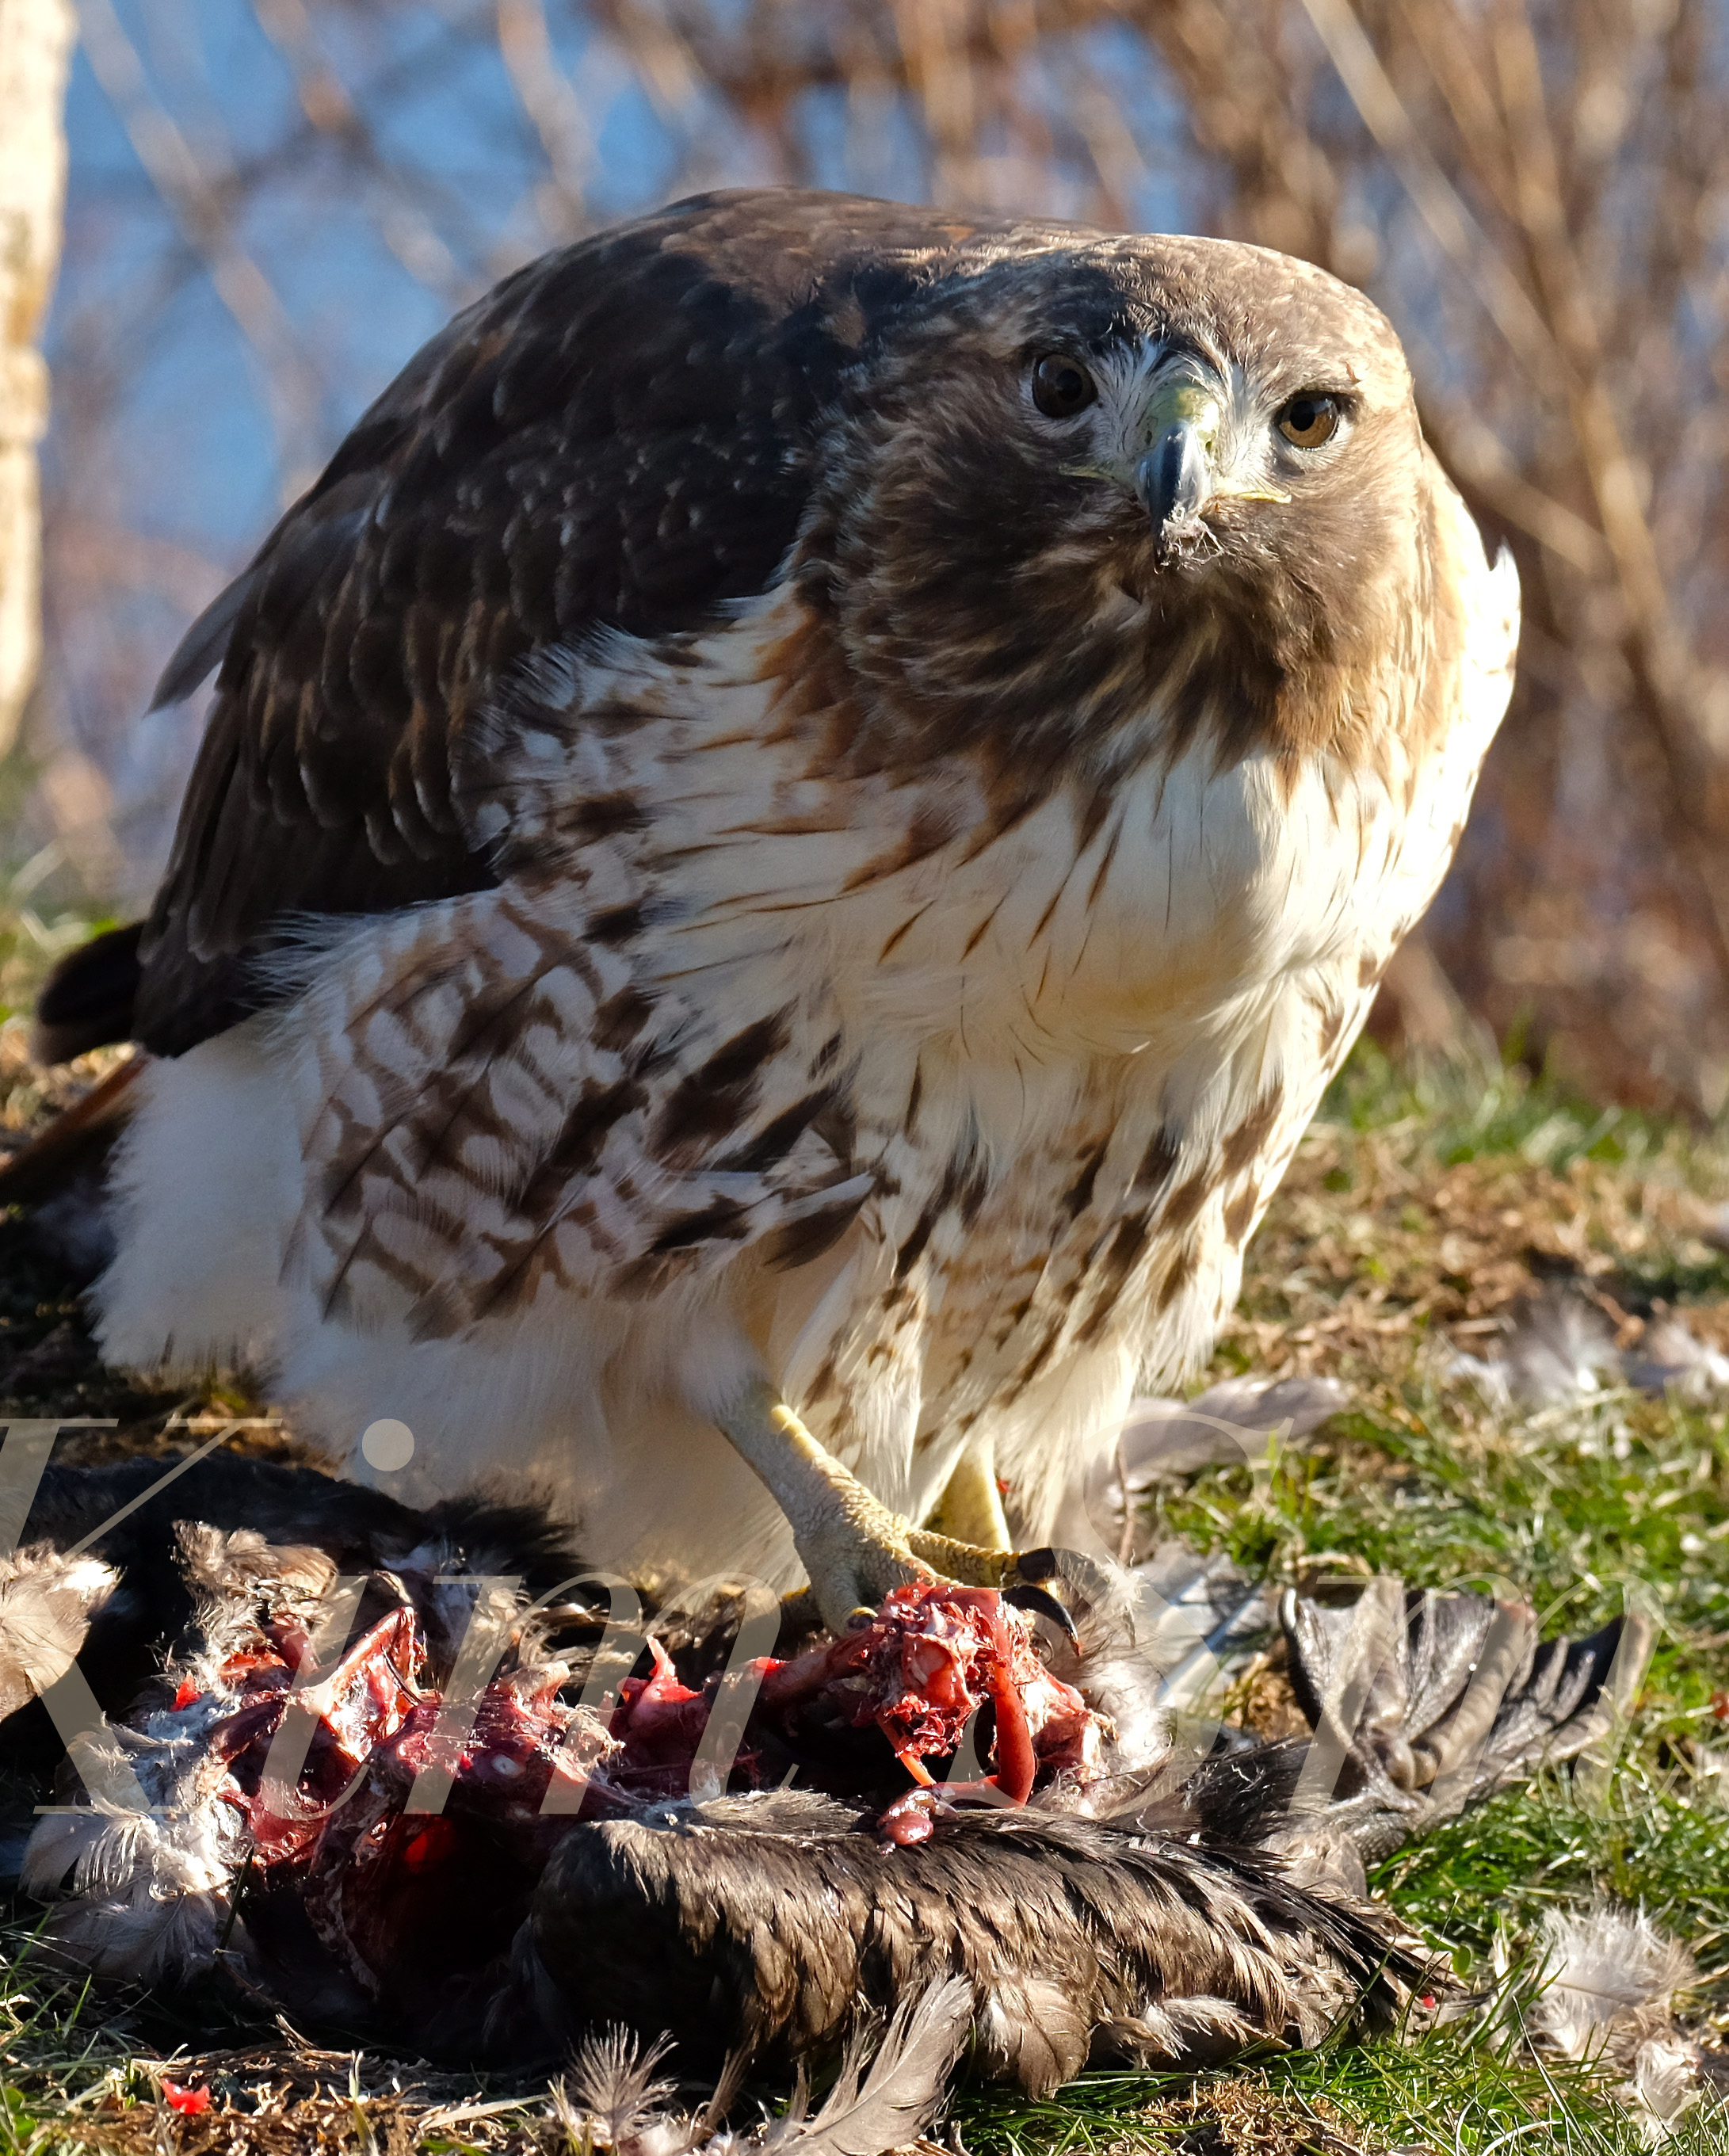 Red Tailed Hawk Eating Prey Gloucester Massachusetts 17 Copyright Kim Smith Kim Smith Films